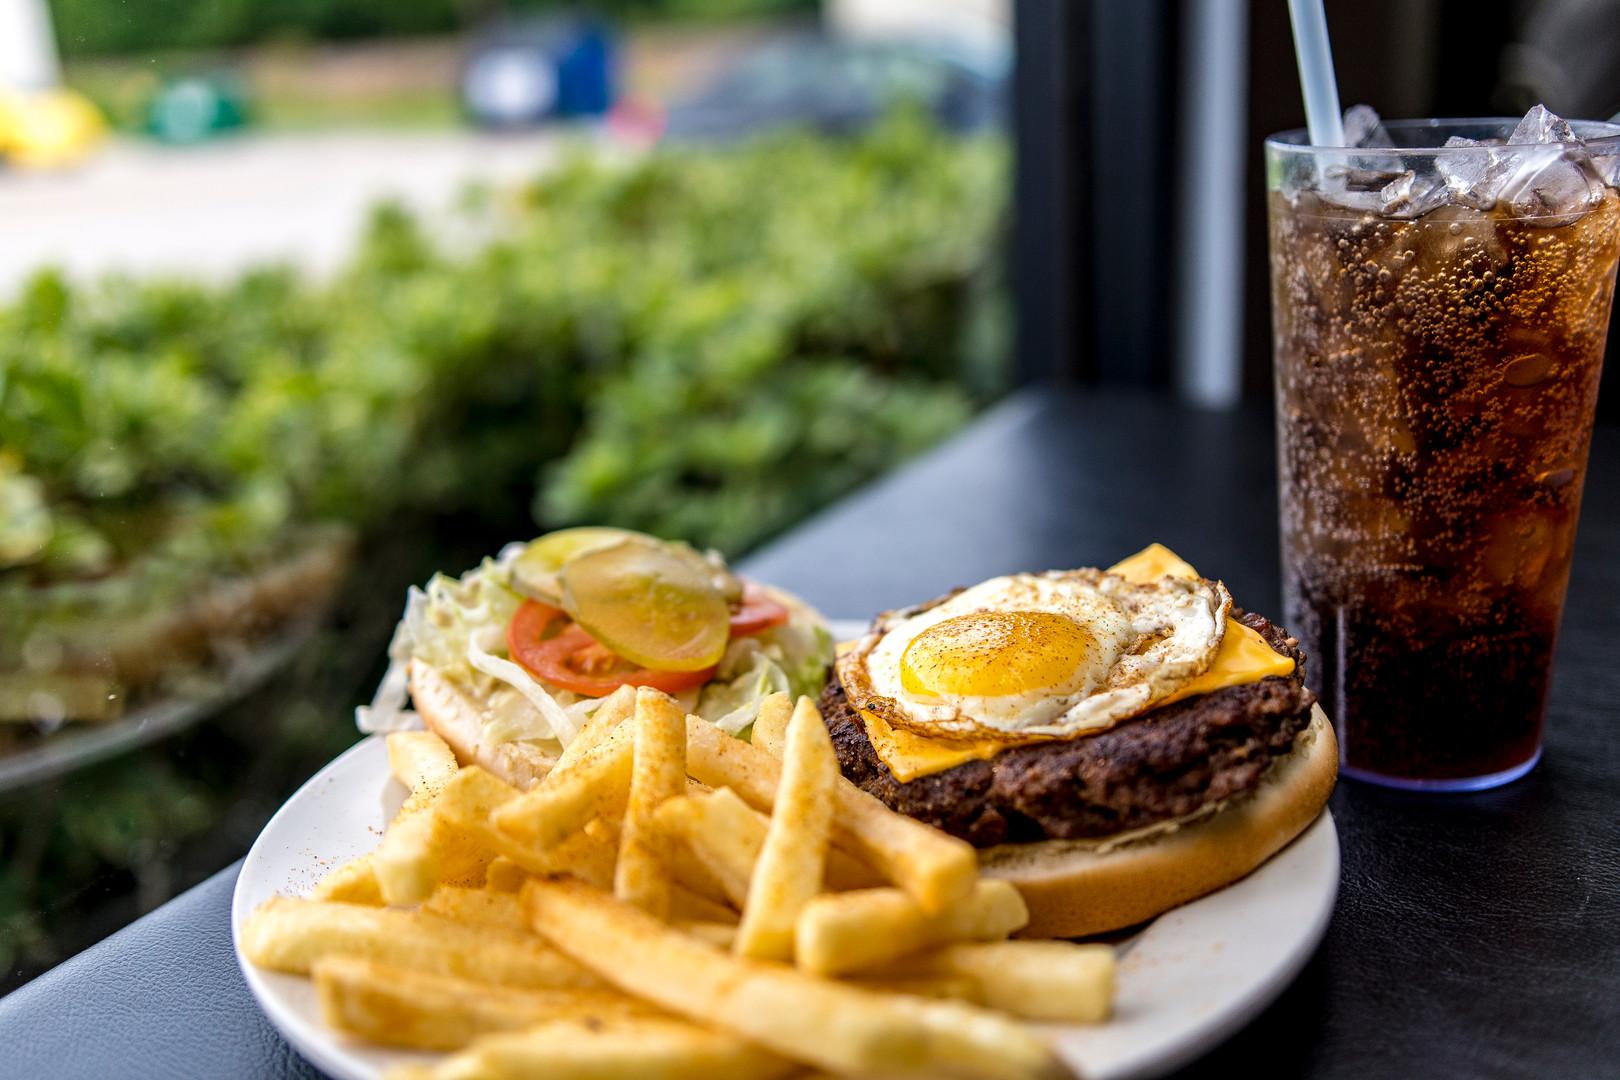 Cheeseburger with Sunnyside Egg